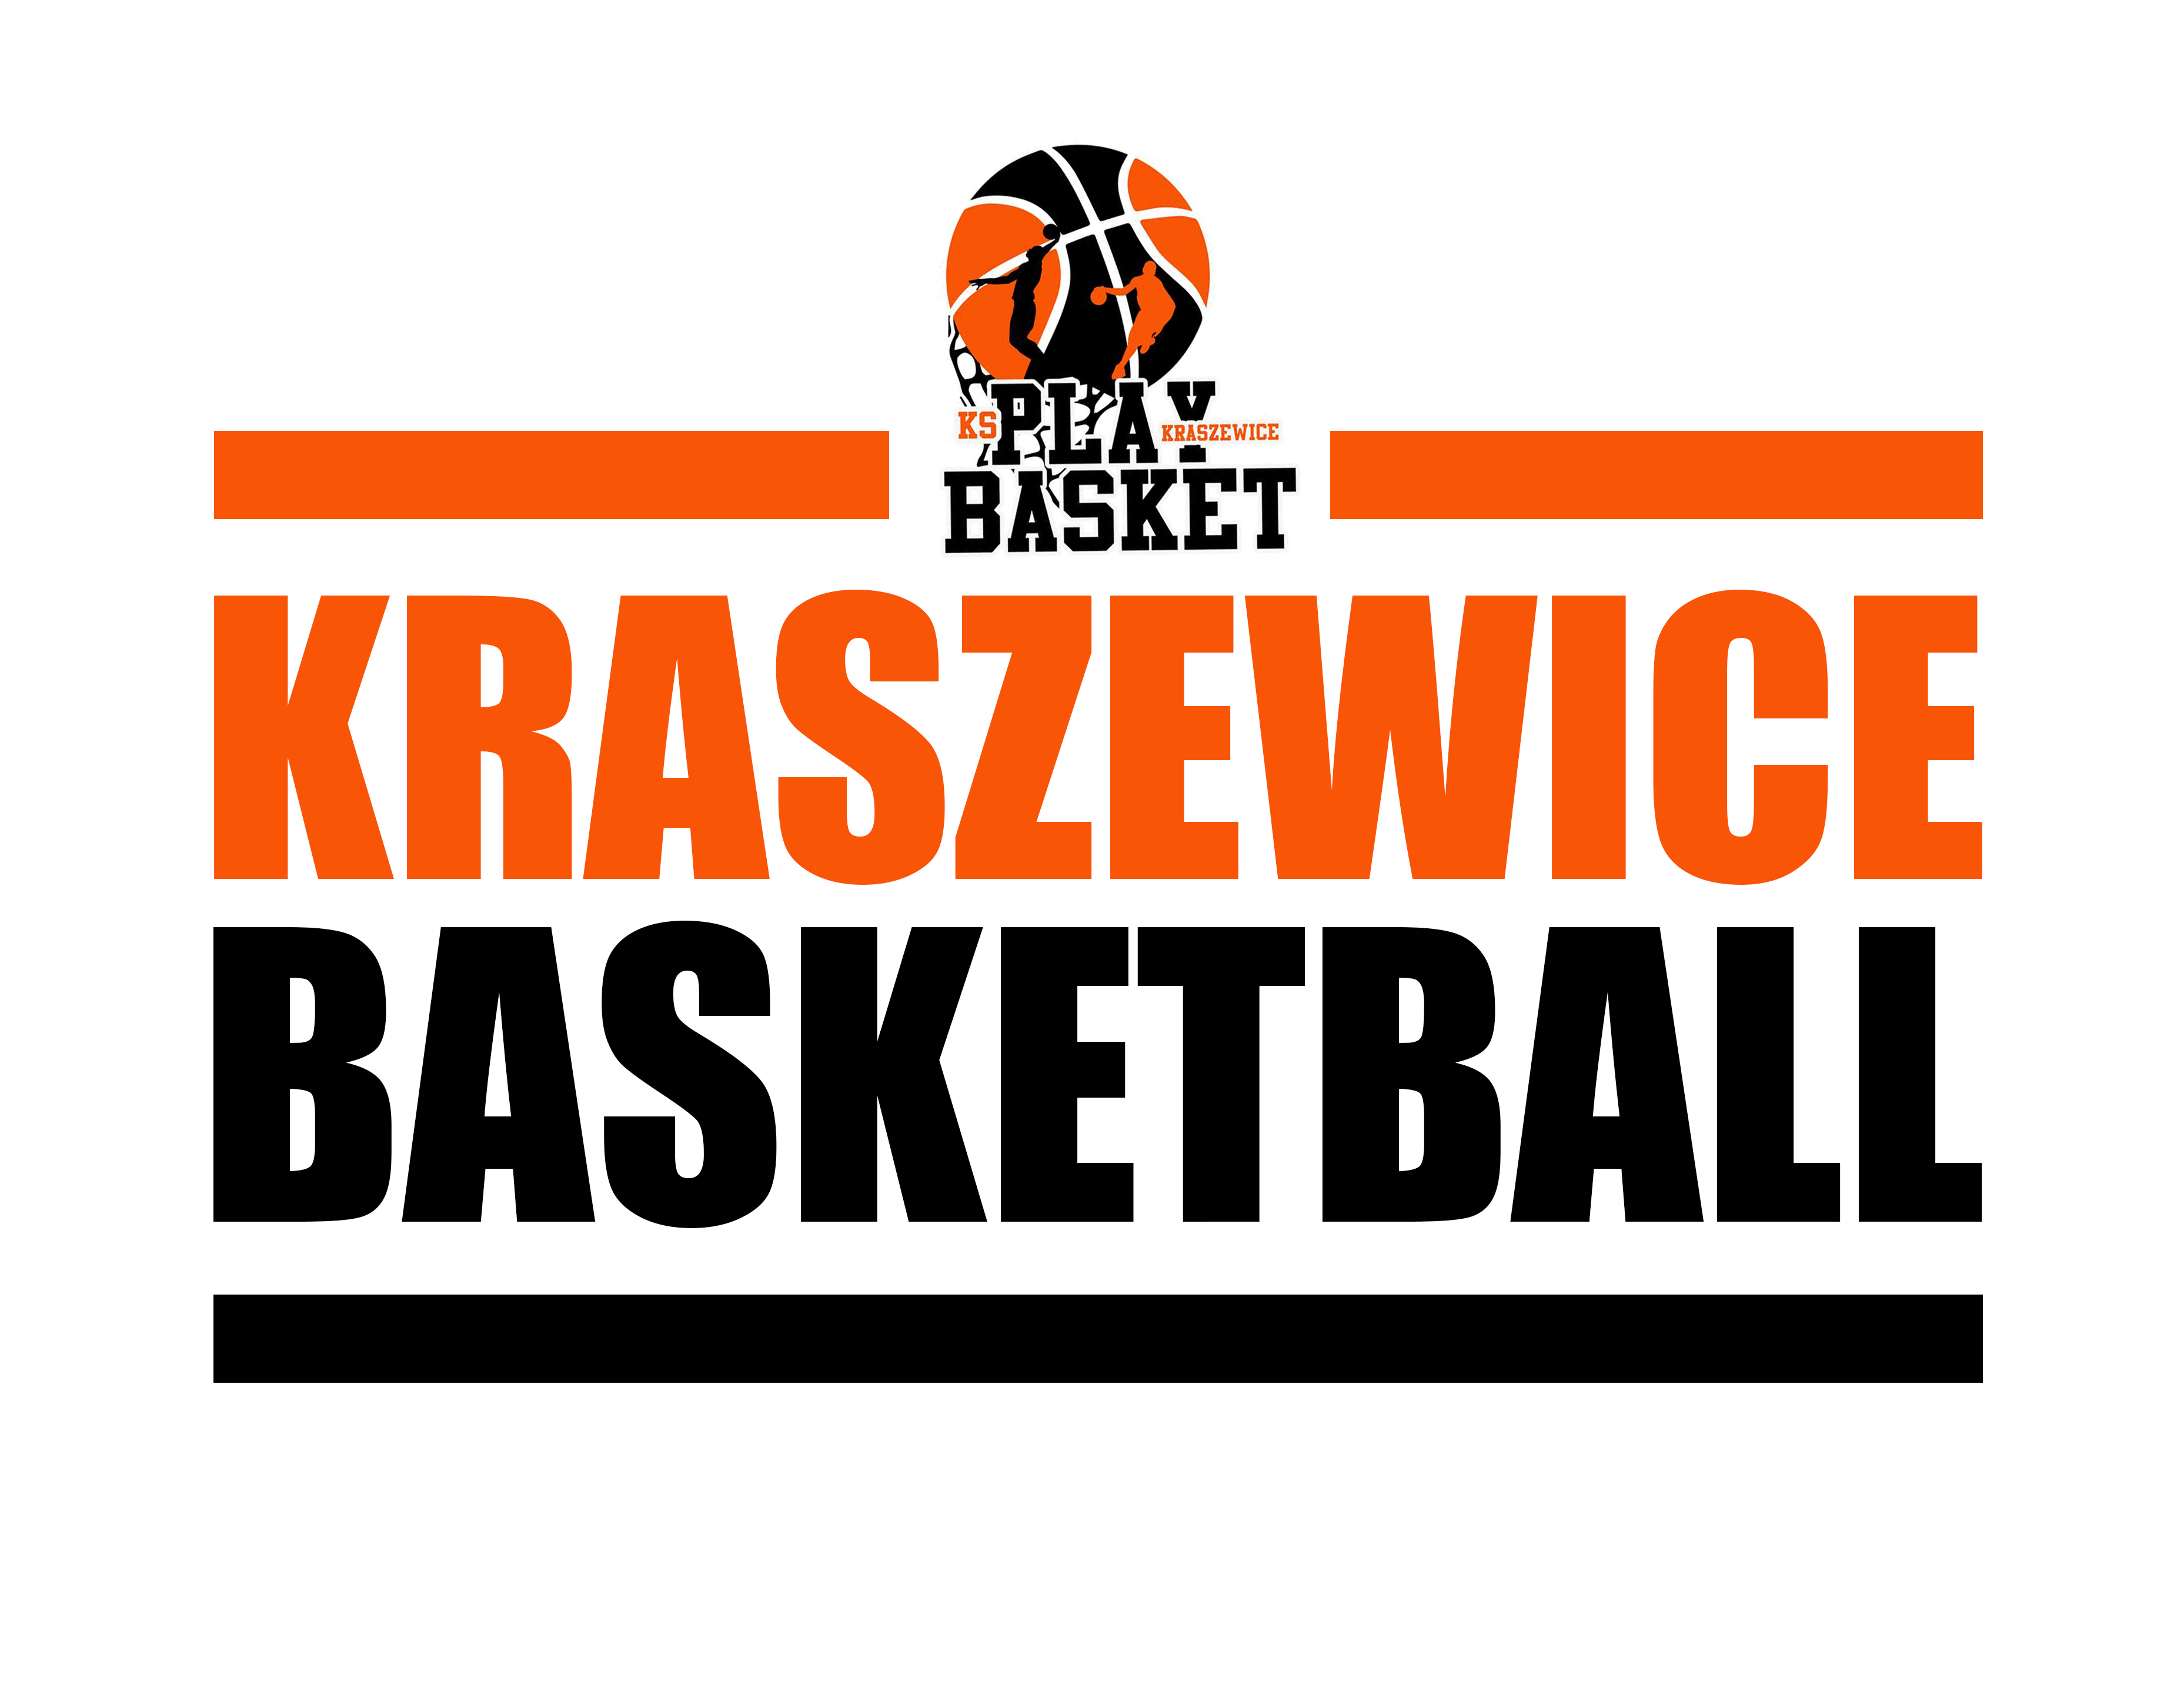 kraszewicebasketballpng